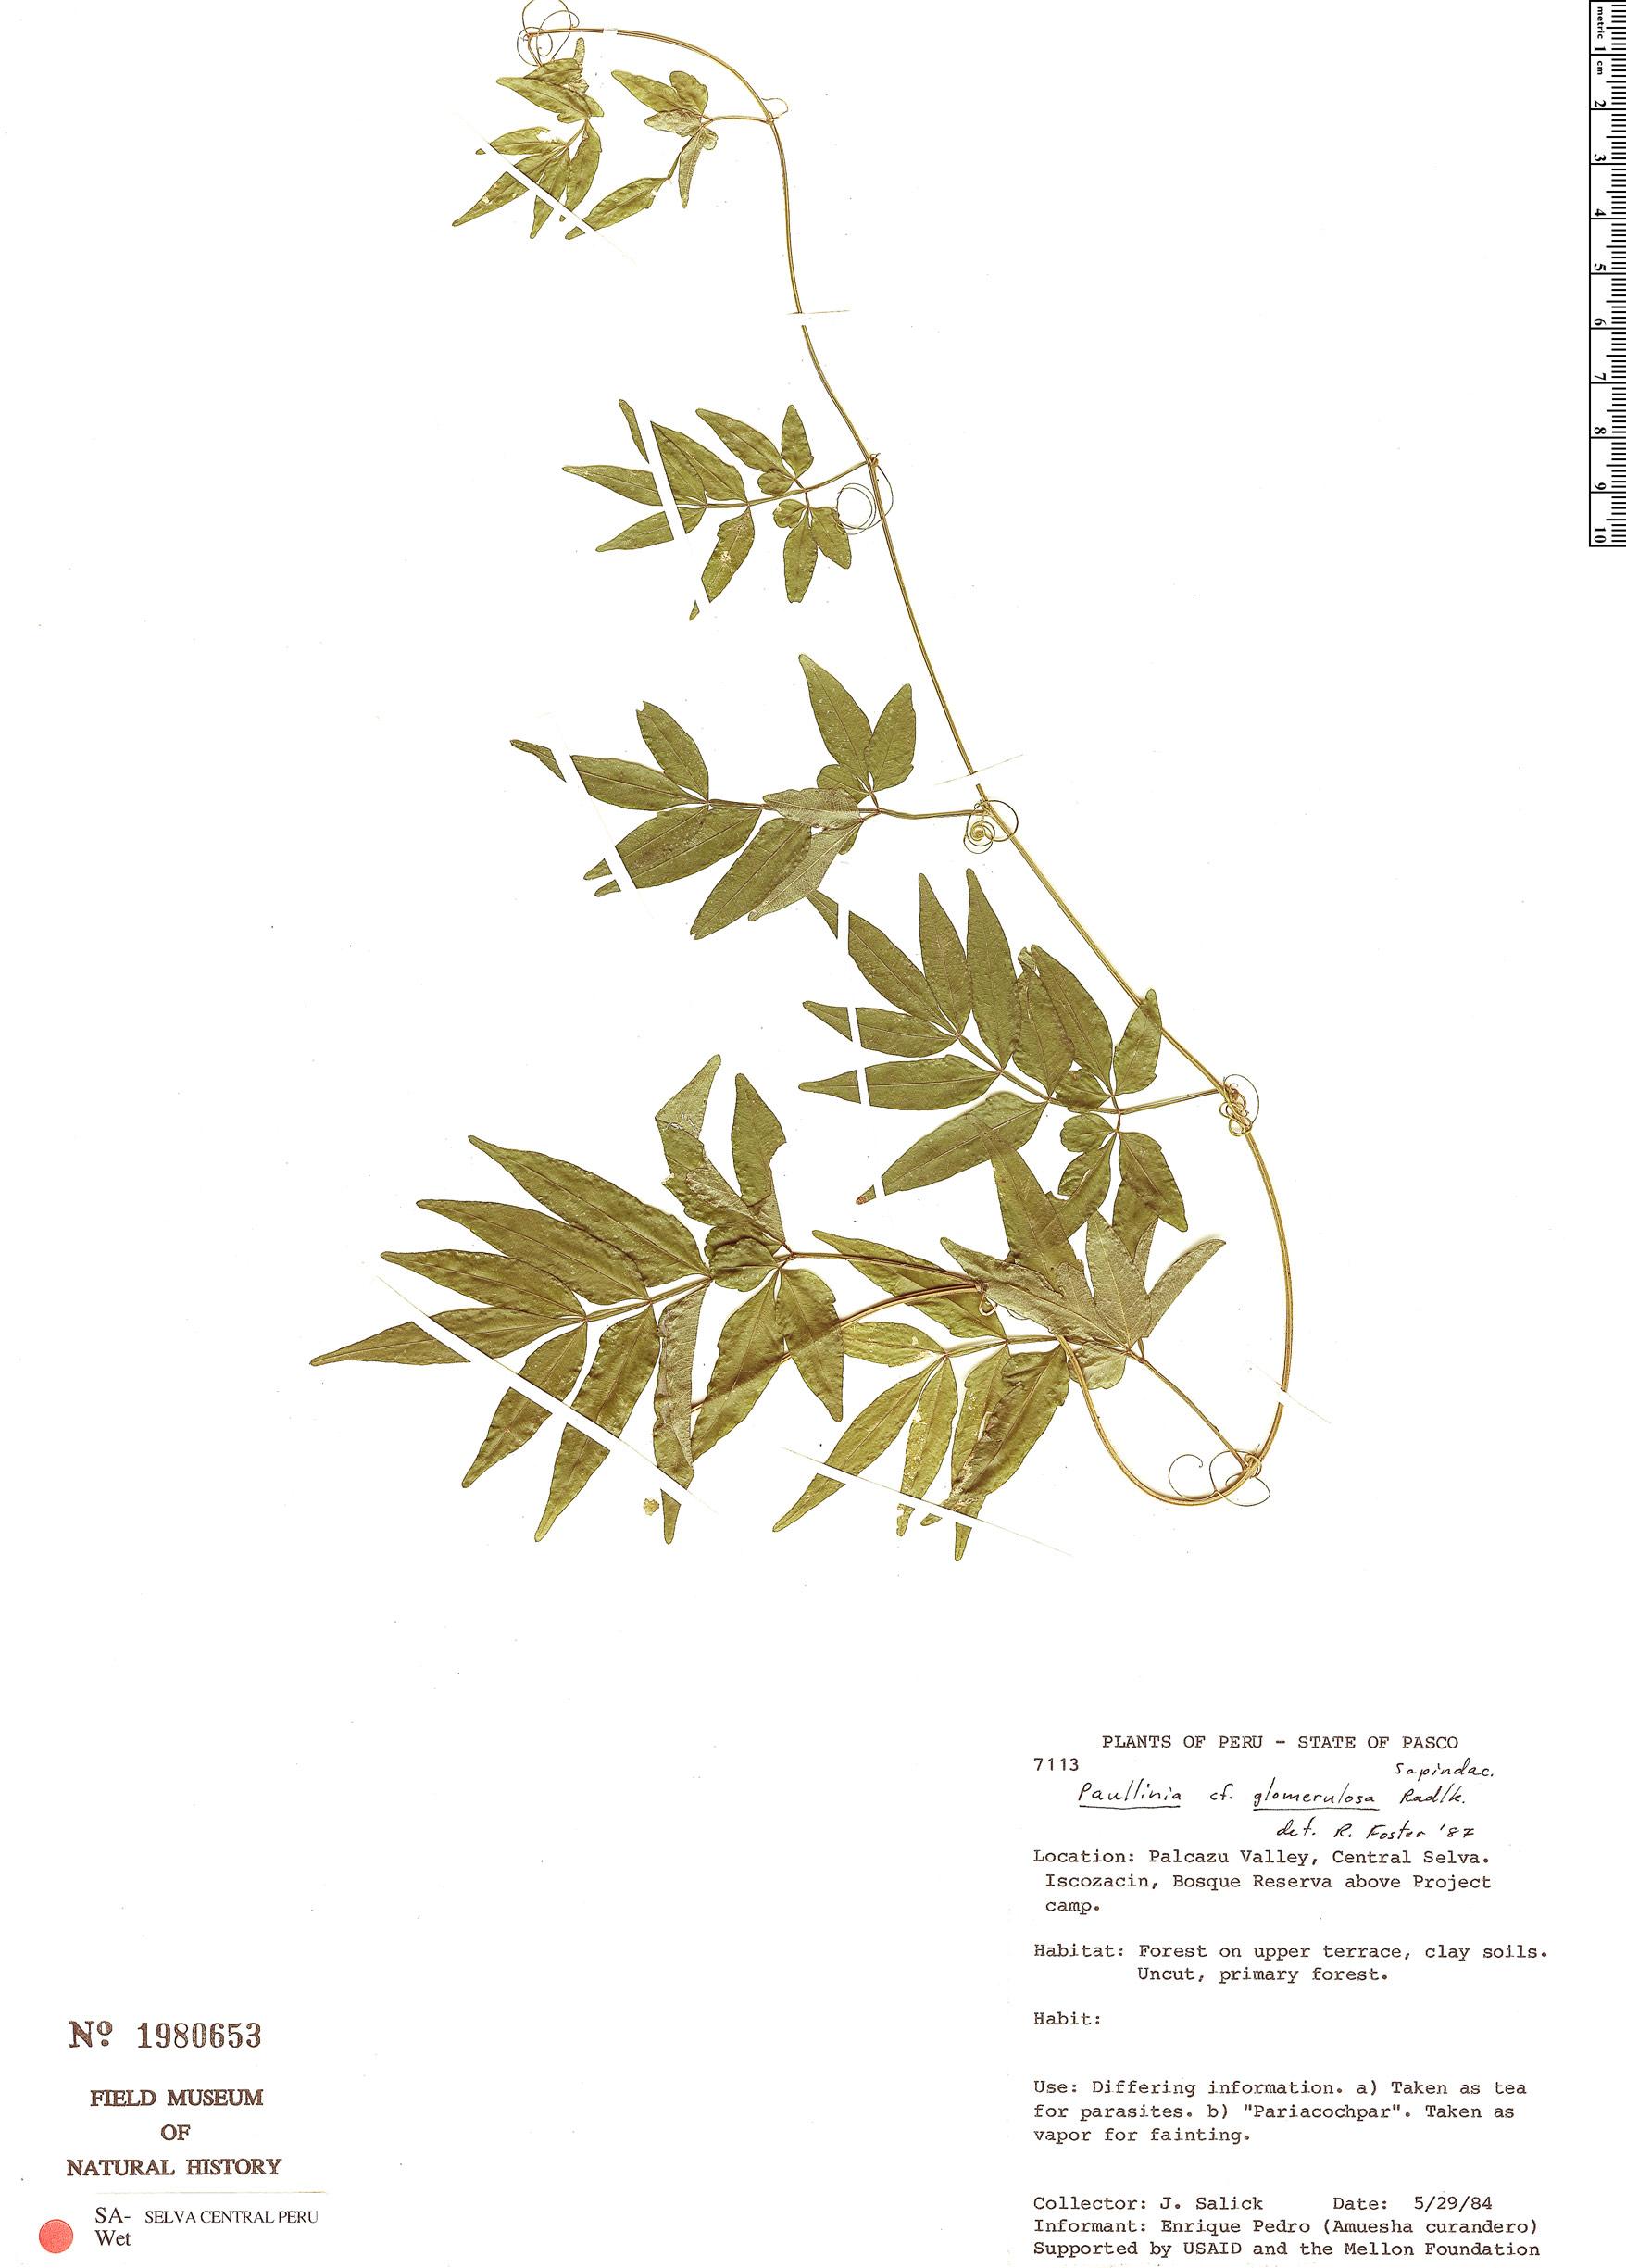 Espécime: Paullinia glomerulosa